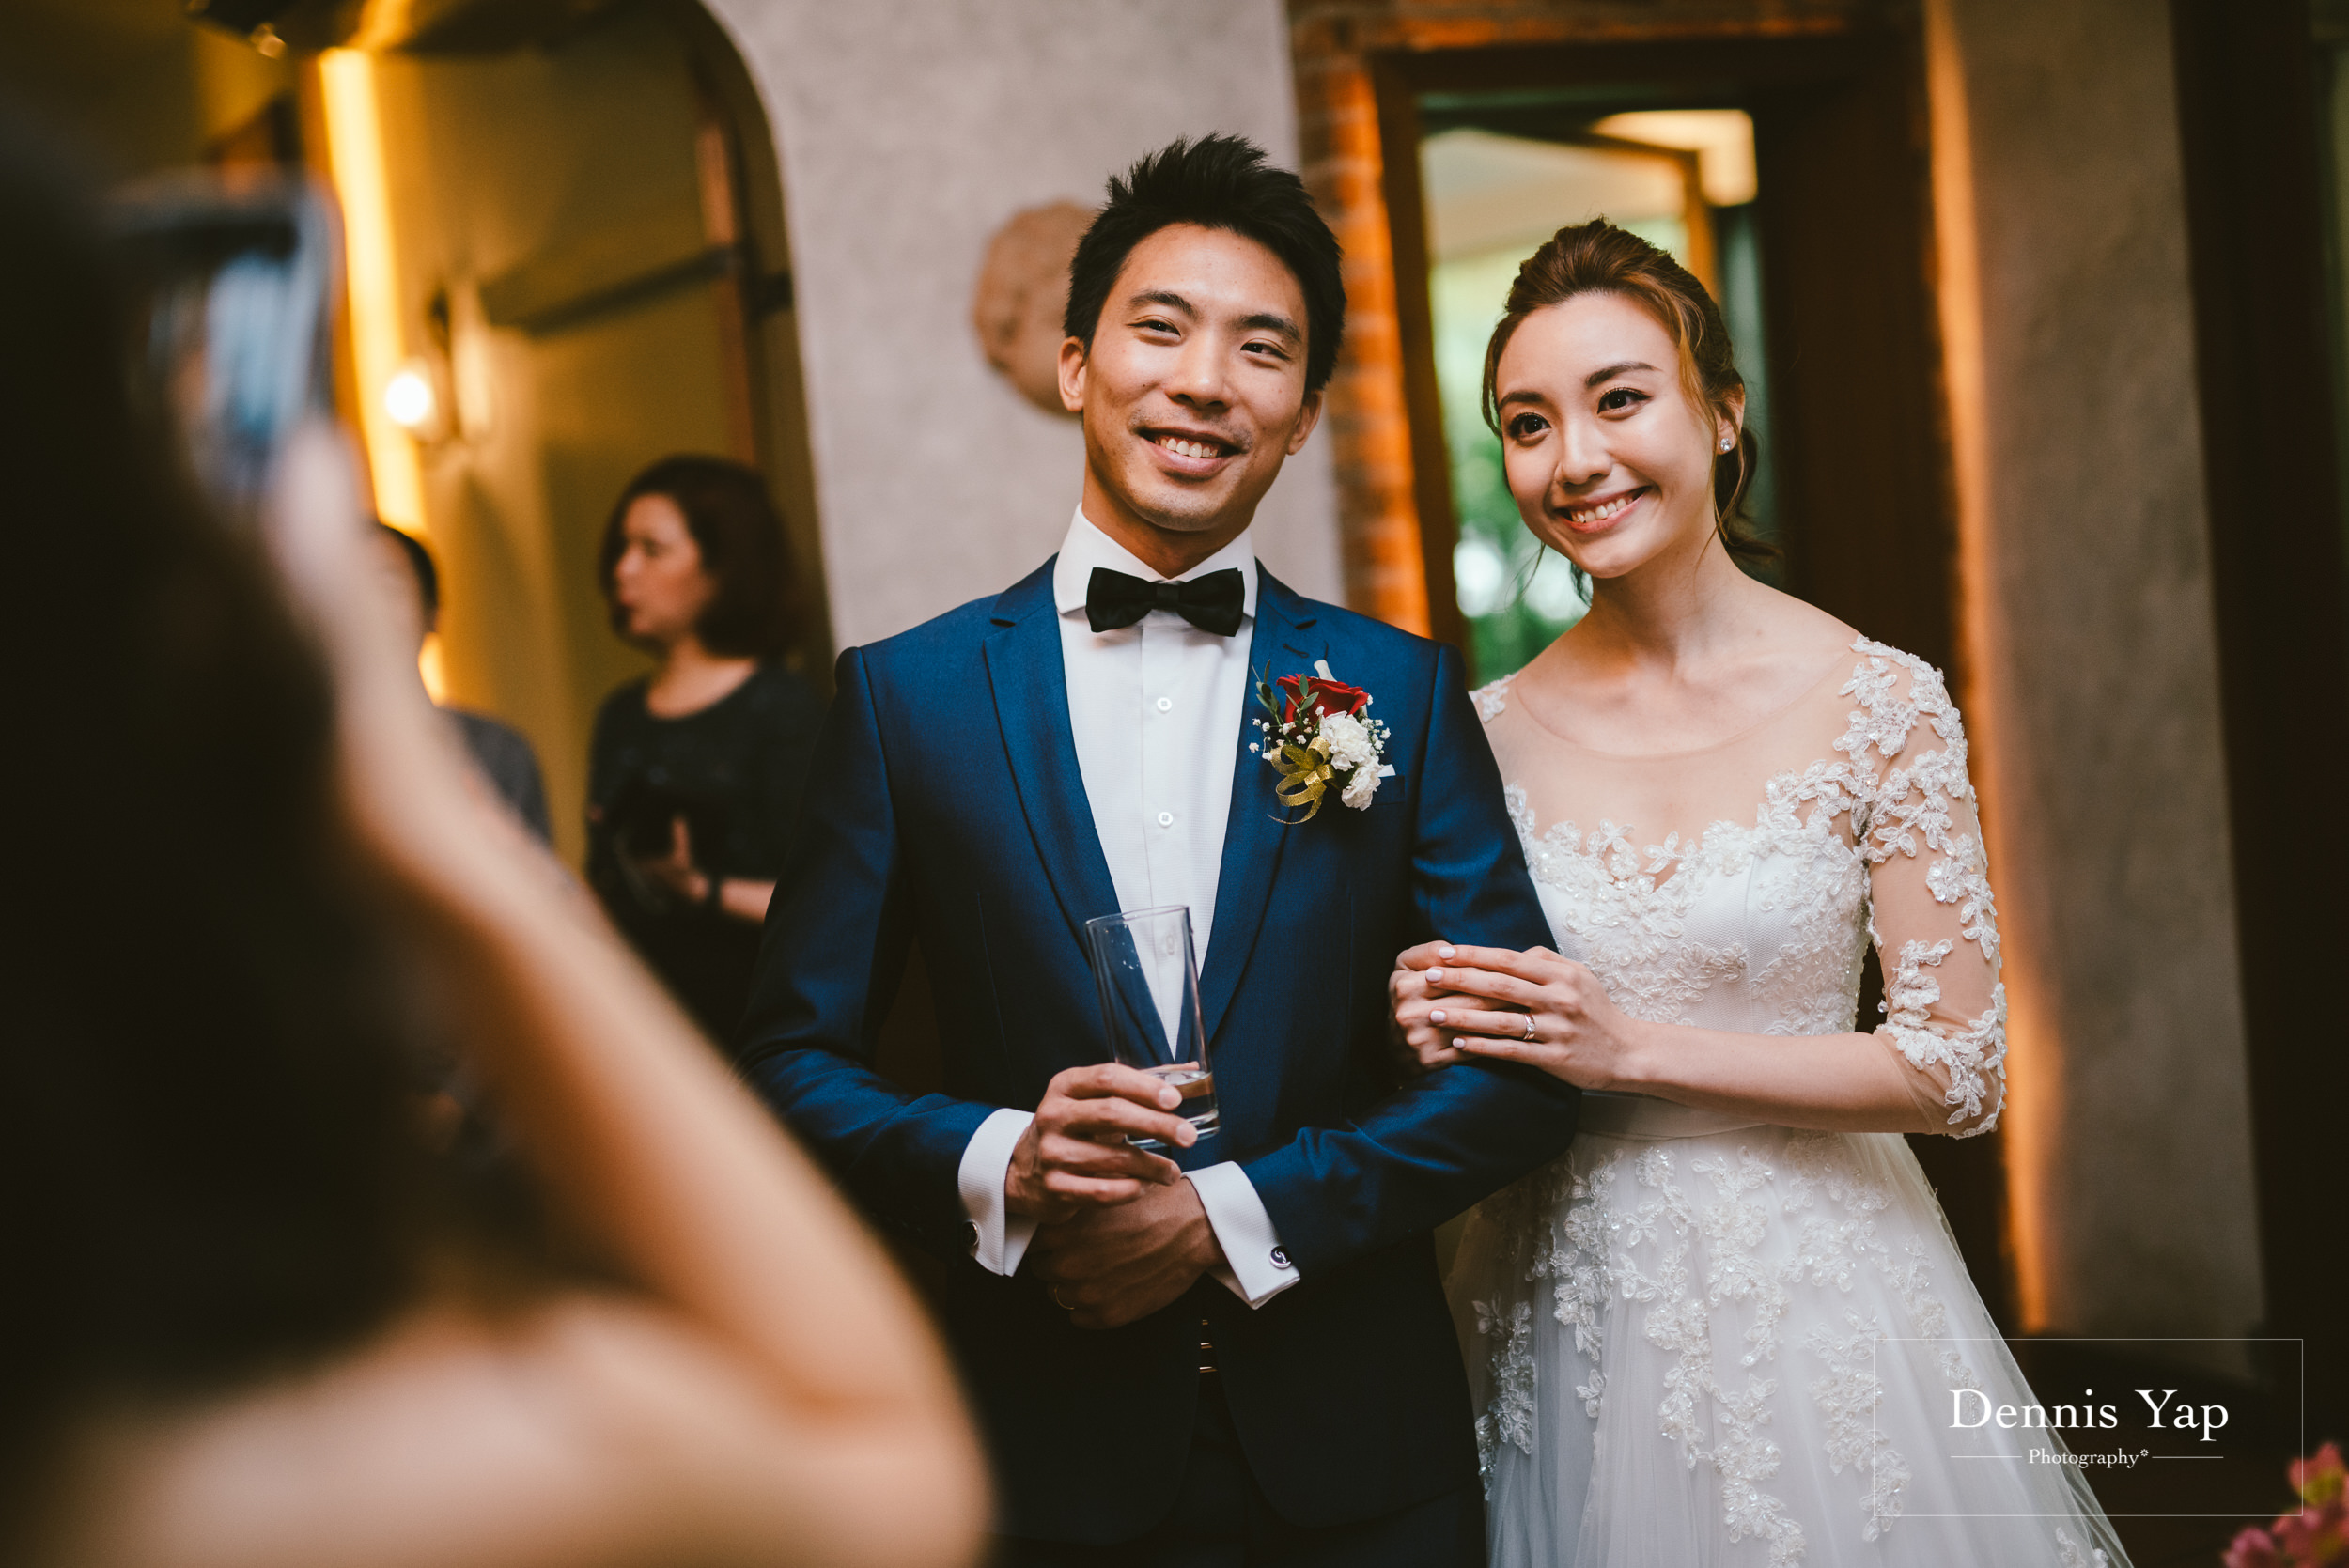 justin hsin wedding day ciao ristorante kuala lumpur dennis yap photography-32.jpg